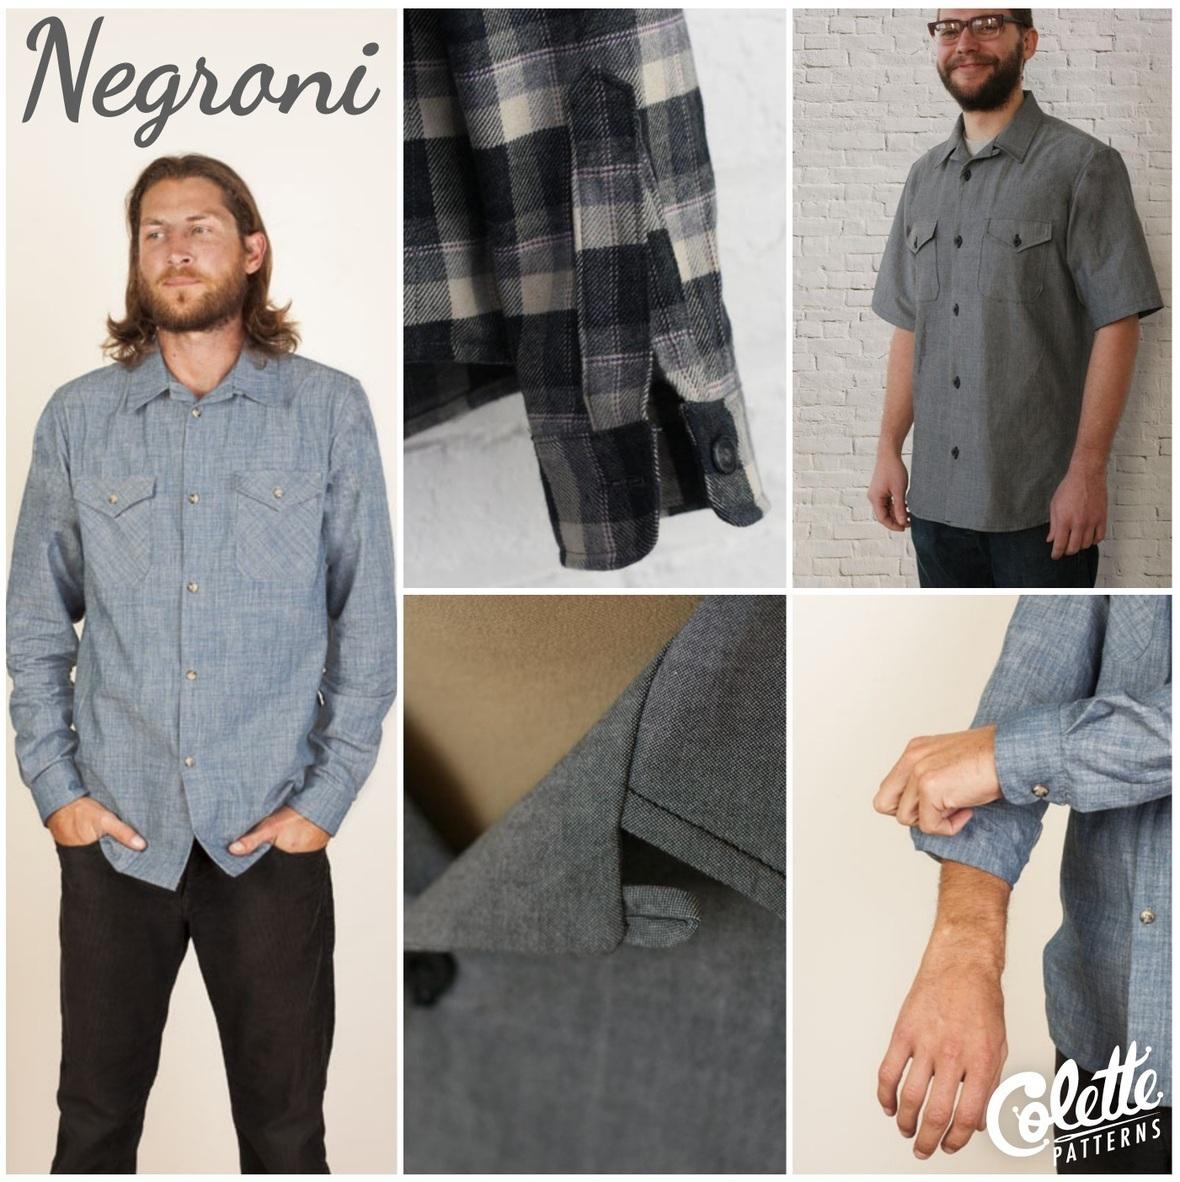 colette patterns negroni shirt sewing pattern